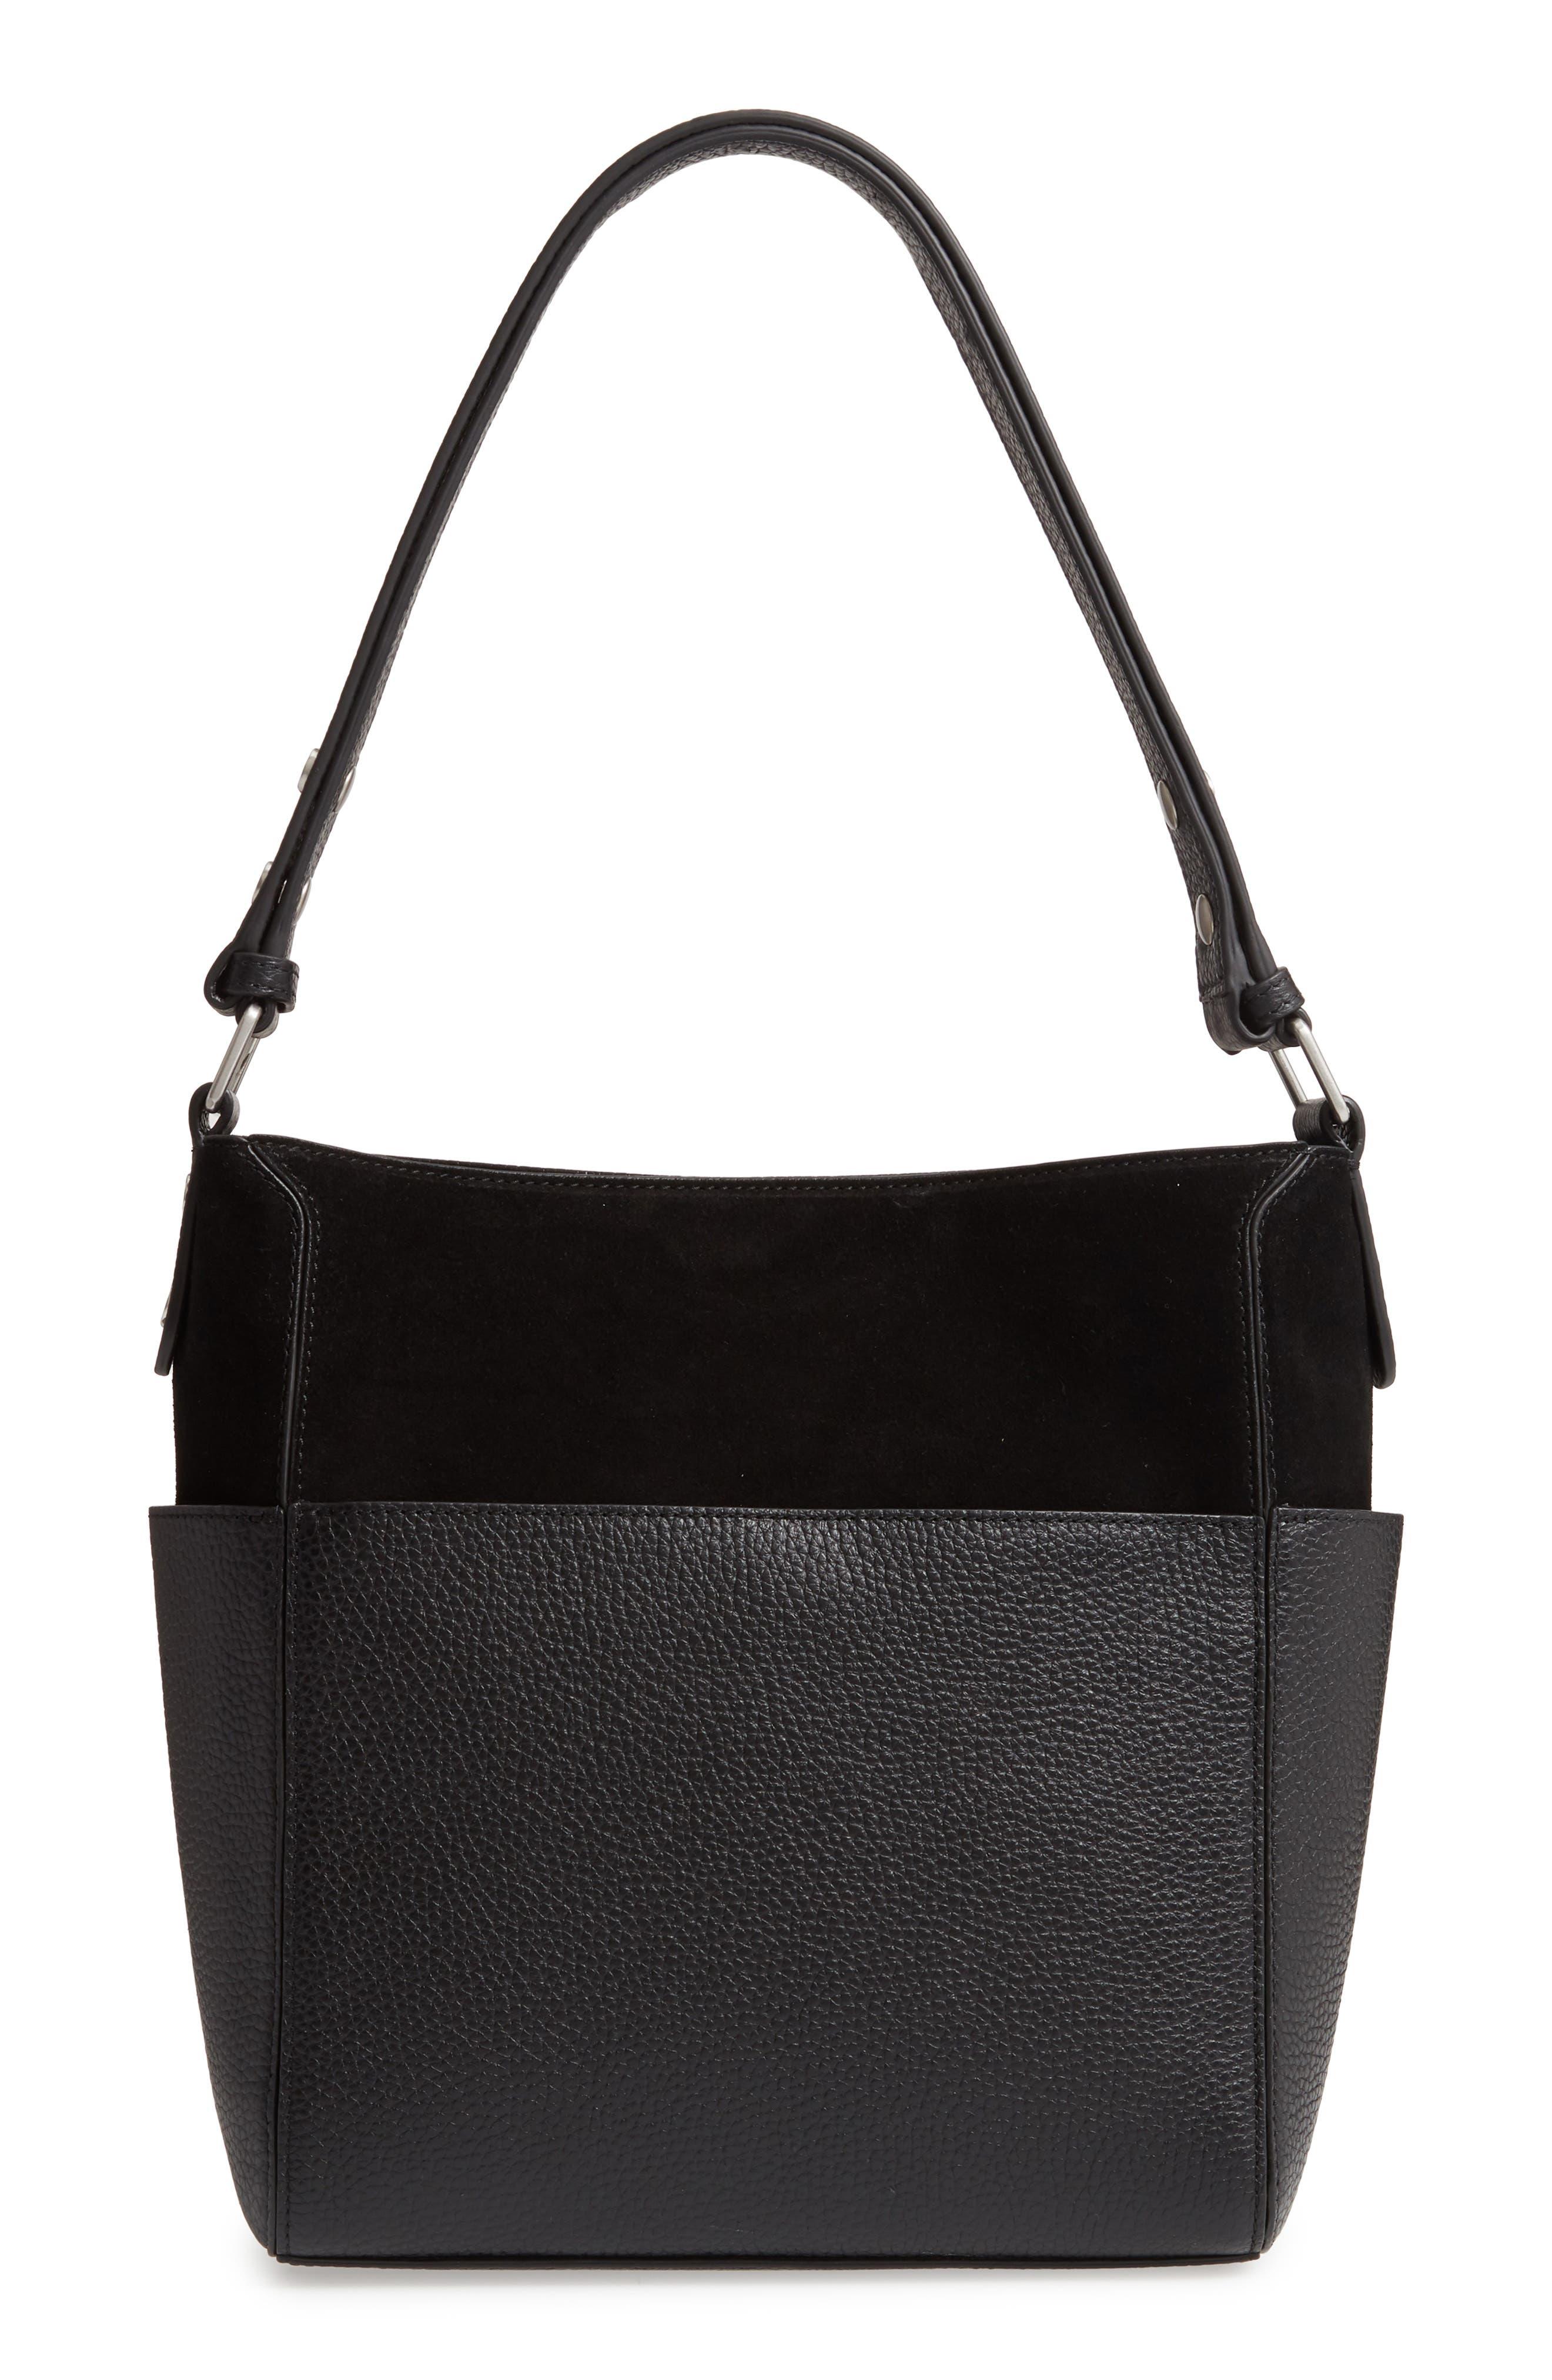 TREASURE & BOND,                             Campbell Leather & Suede Bucket Bag,                             Main thumbnail 1, color,                             BLACK